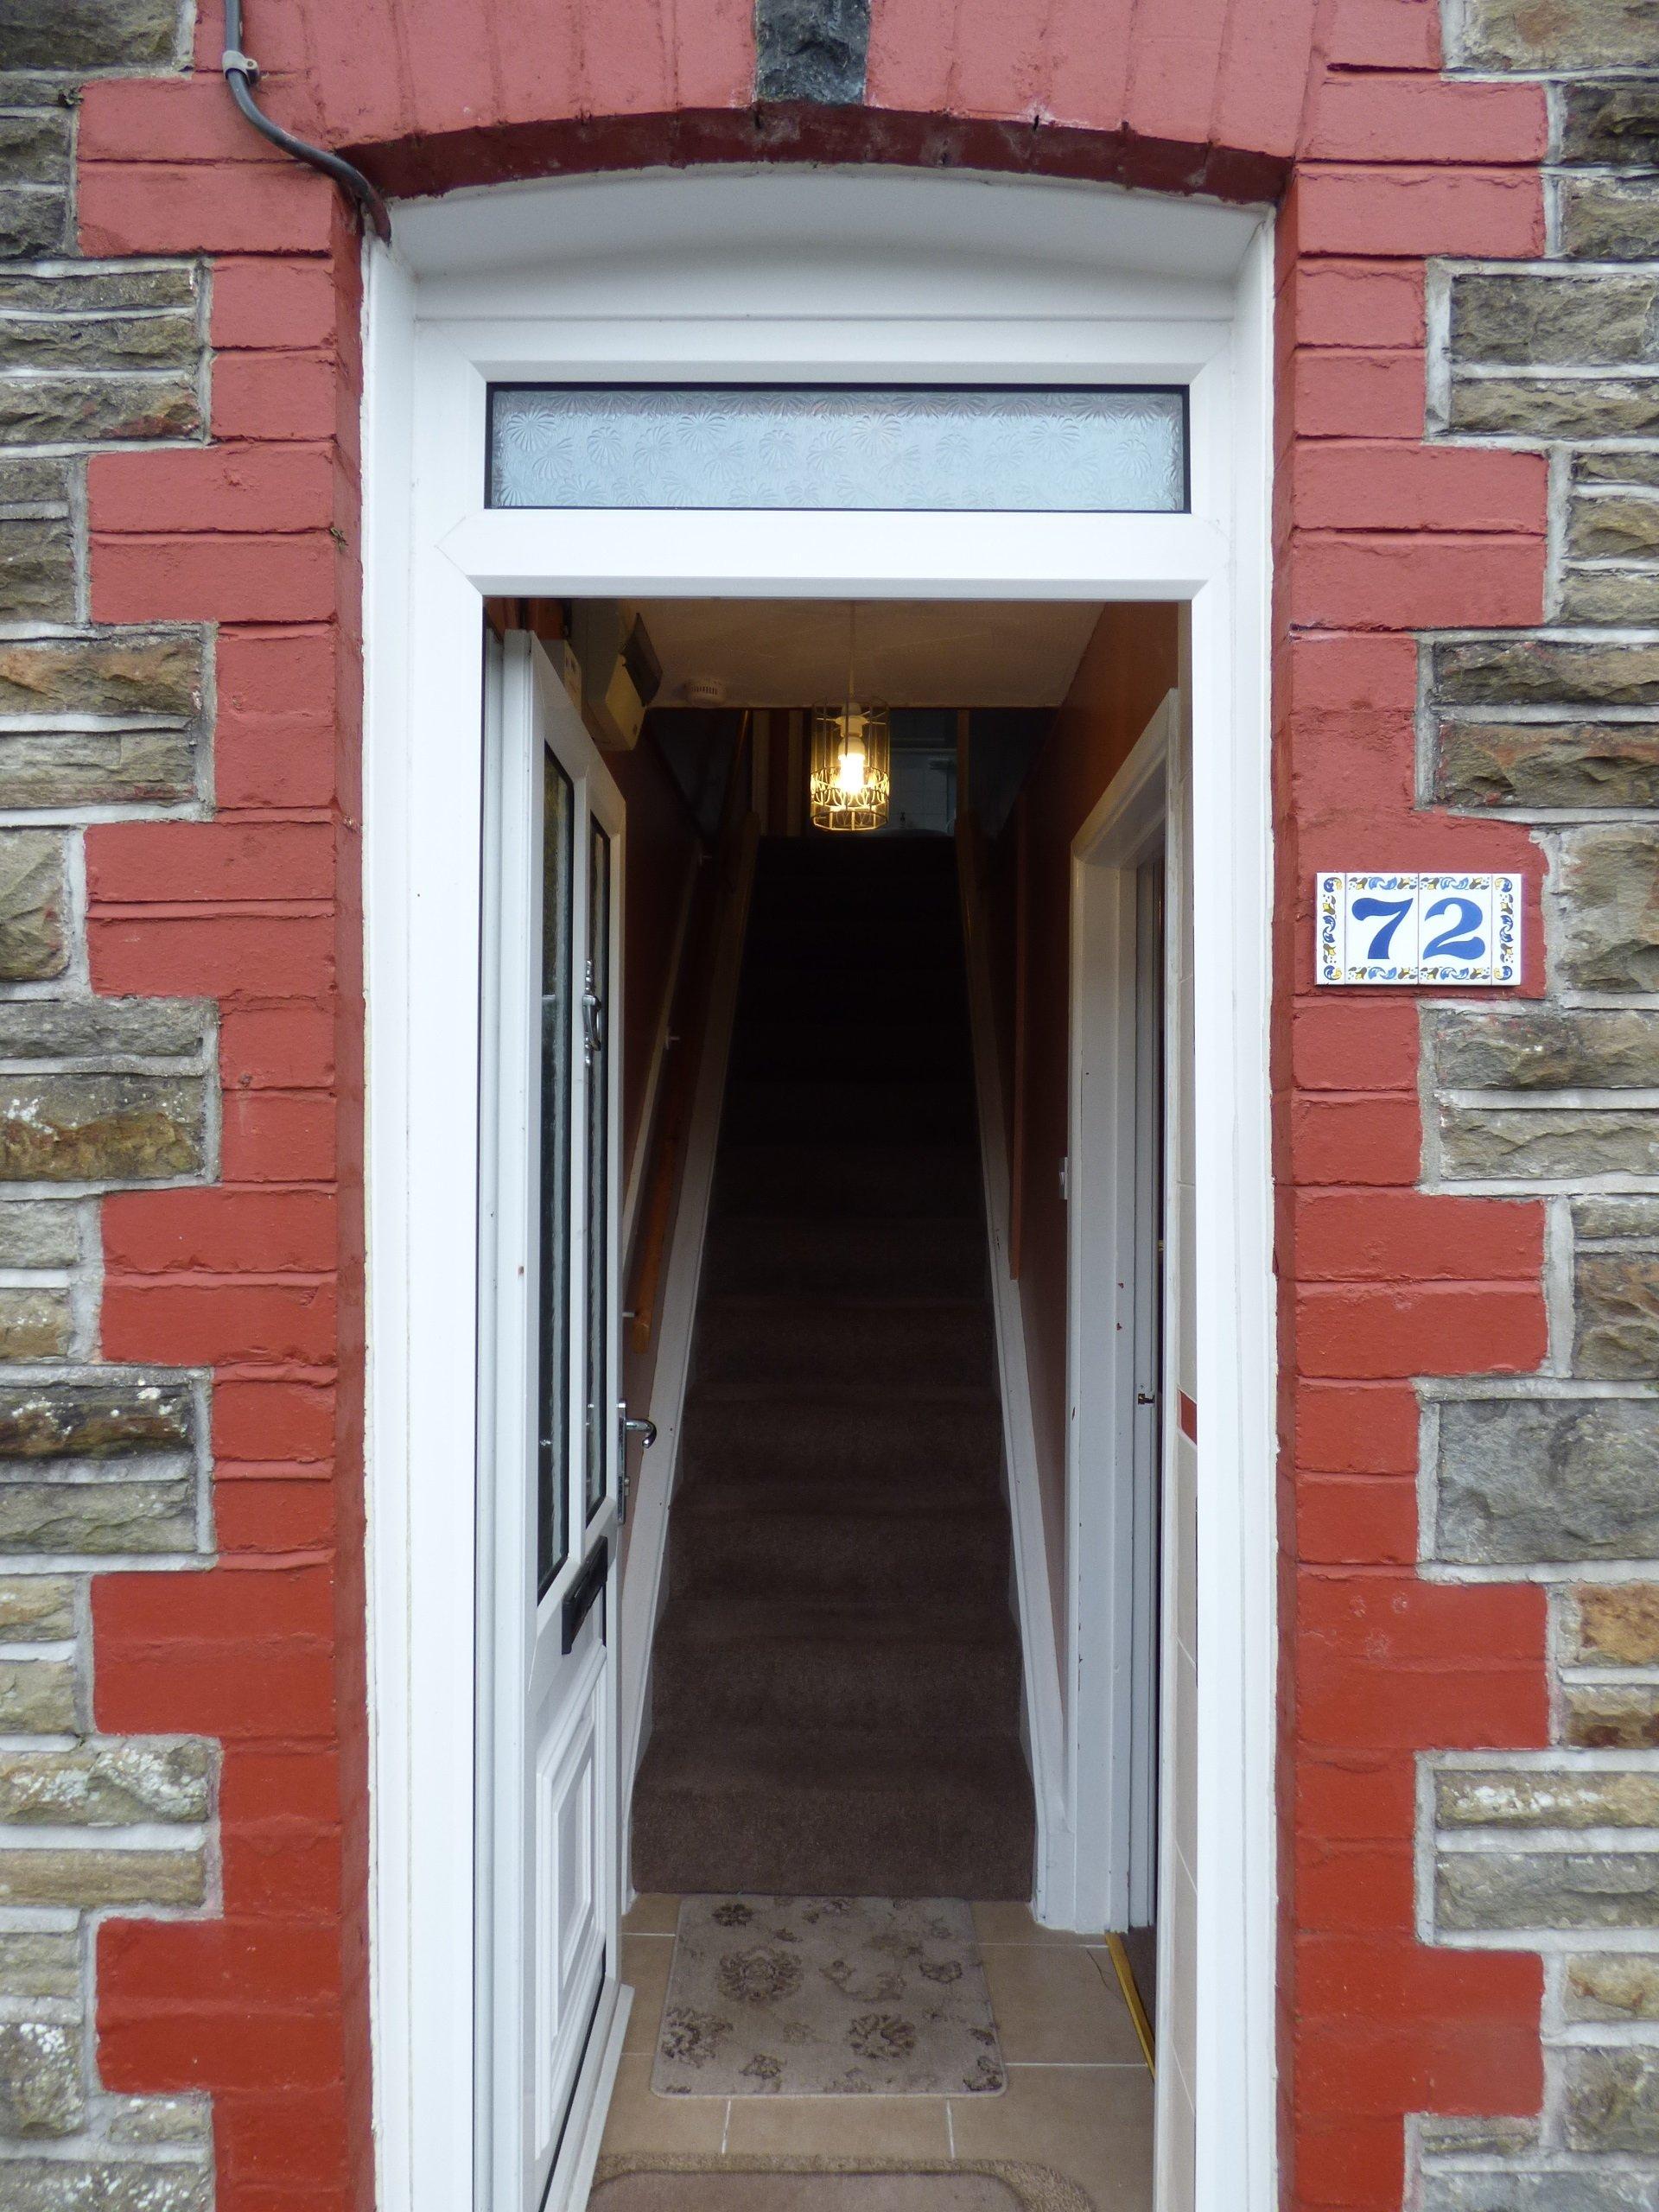 Wisemove. Property for sale. Bridgend Road, Pontycymer. Entrance